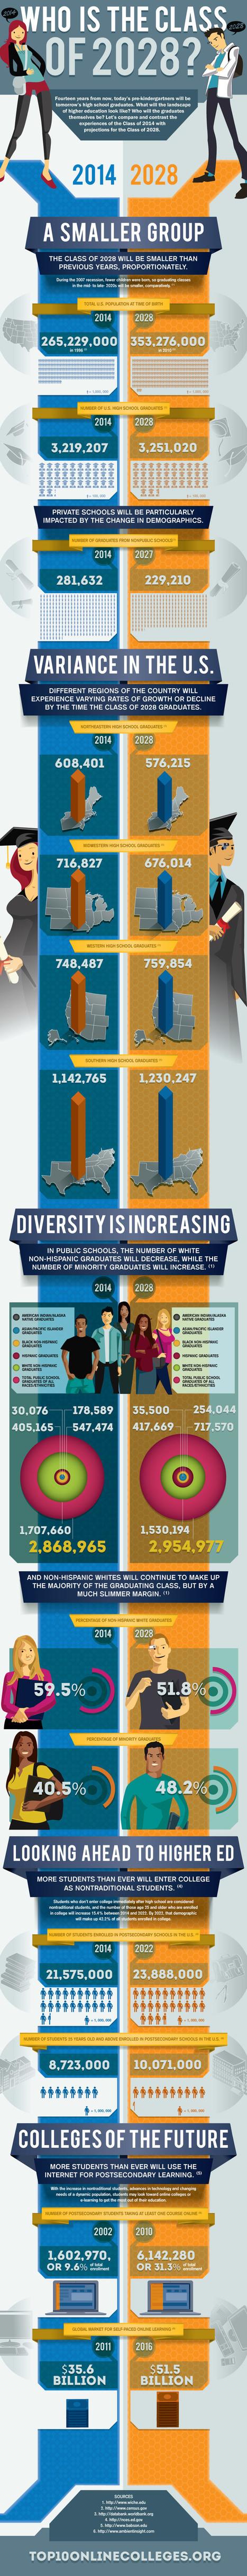 Cómo será la clase de 2028 #infografia #infographic #education | infografiando | Scoop.it